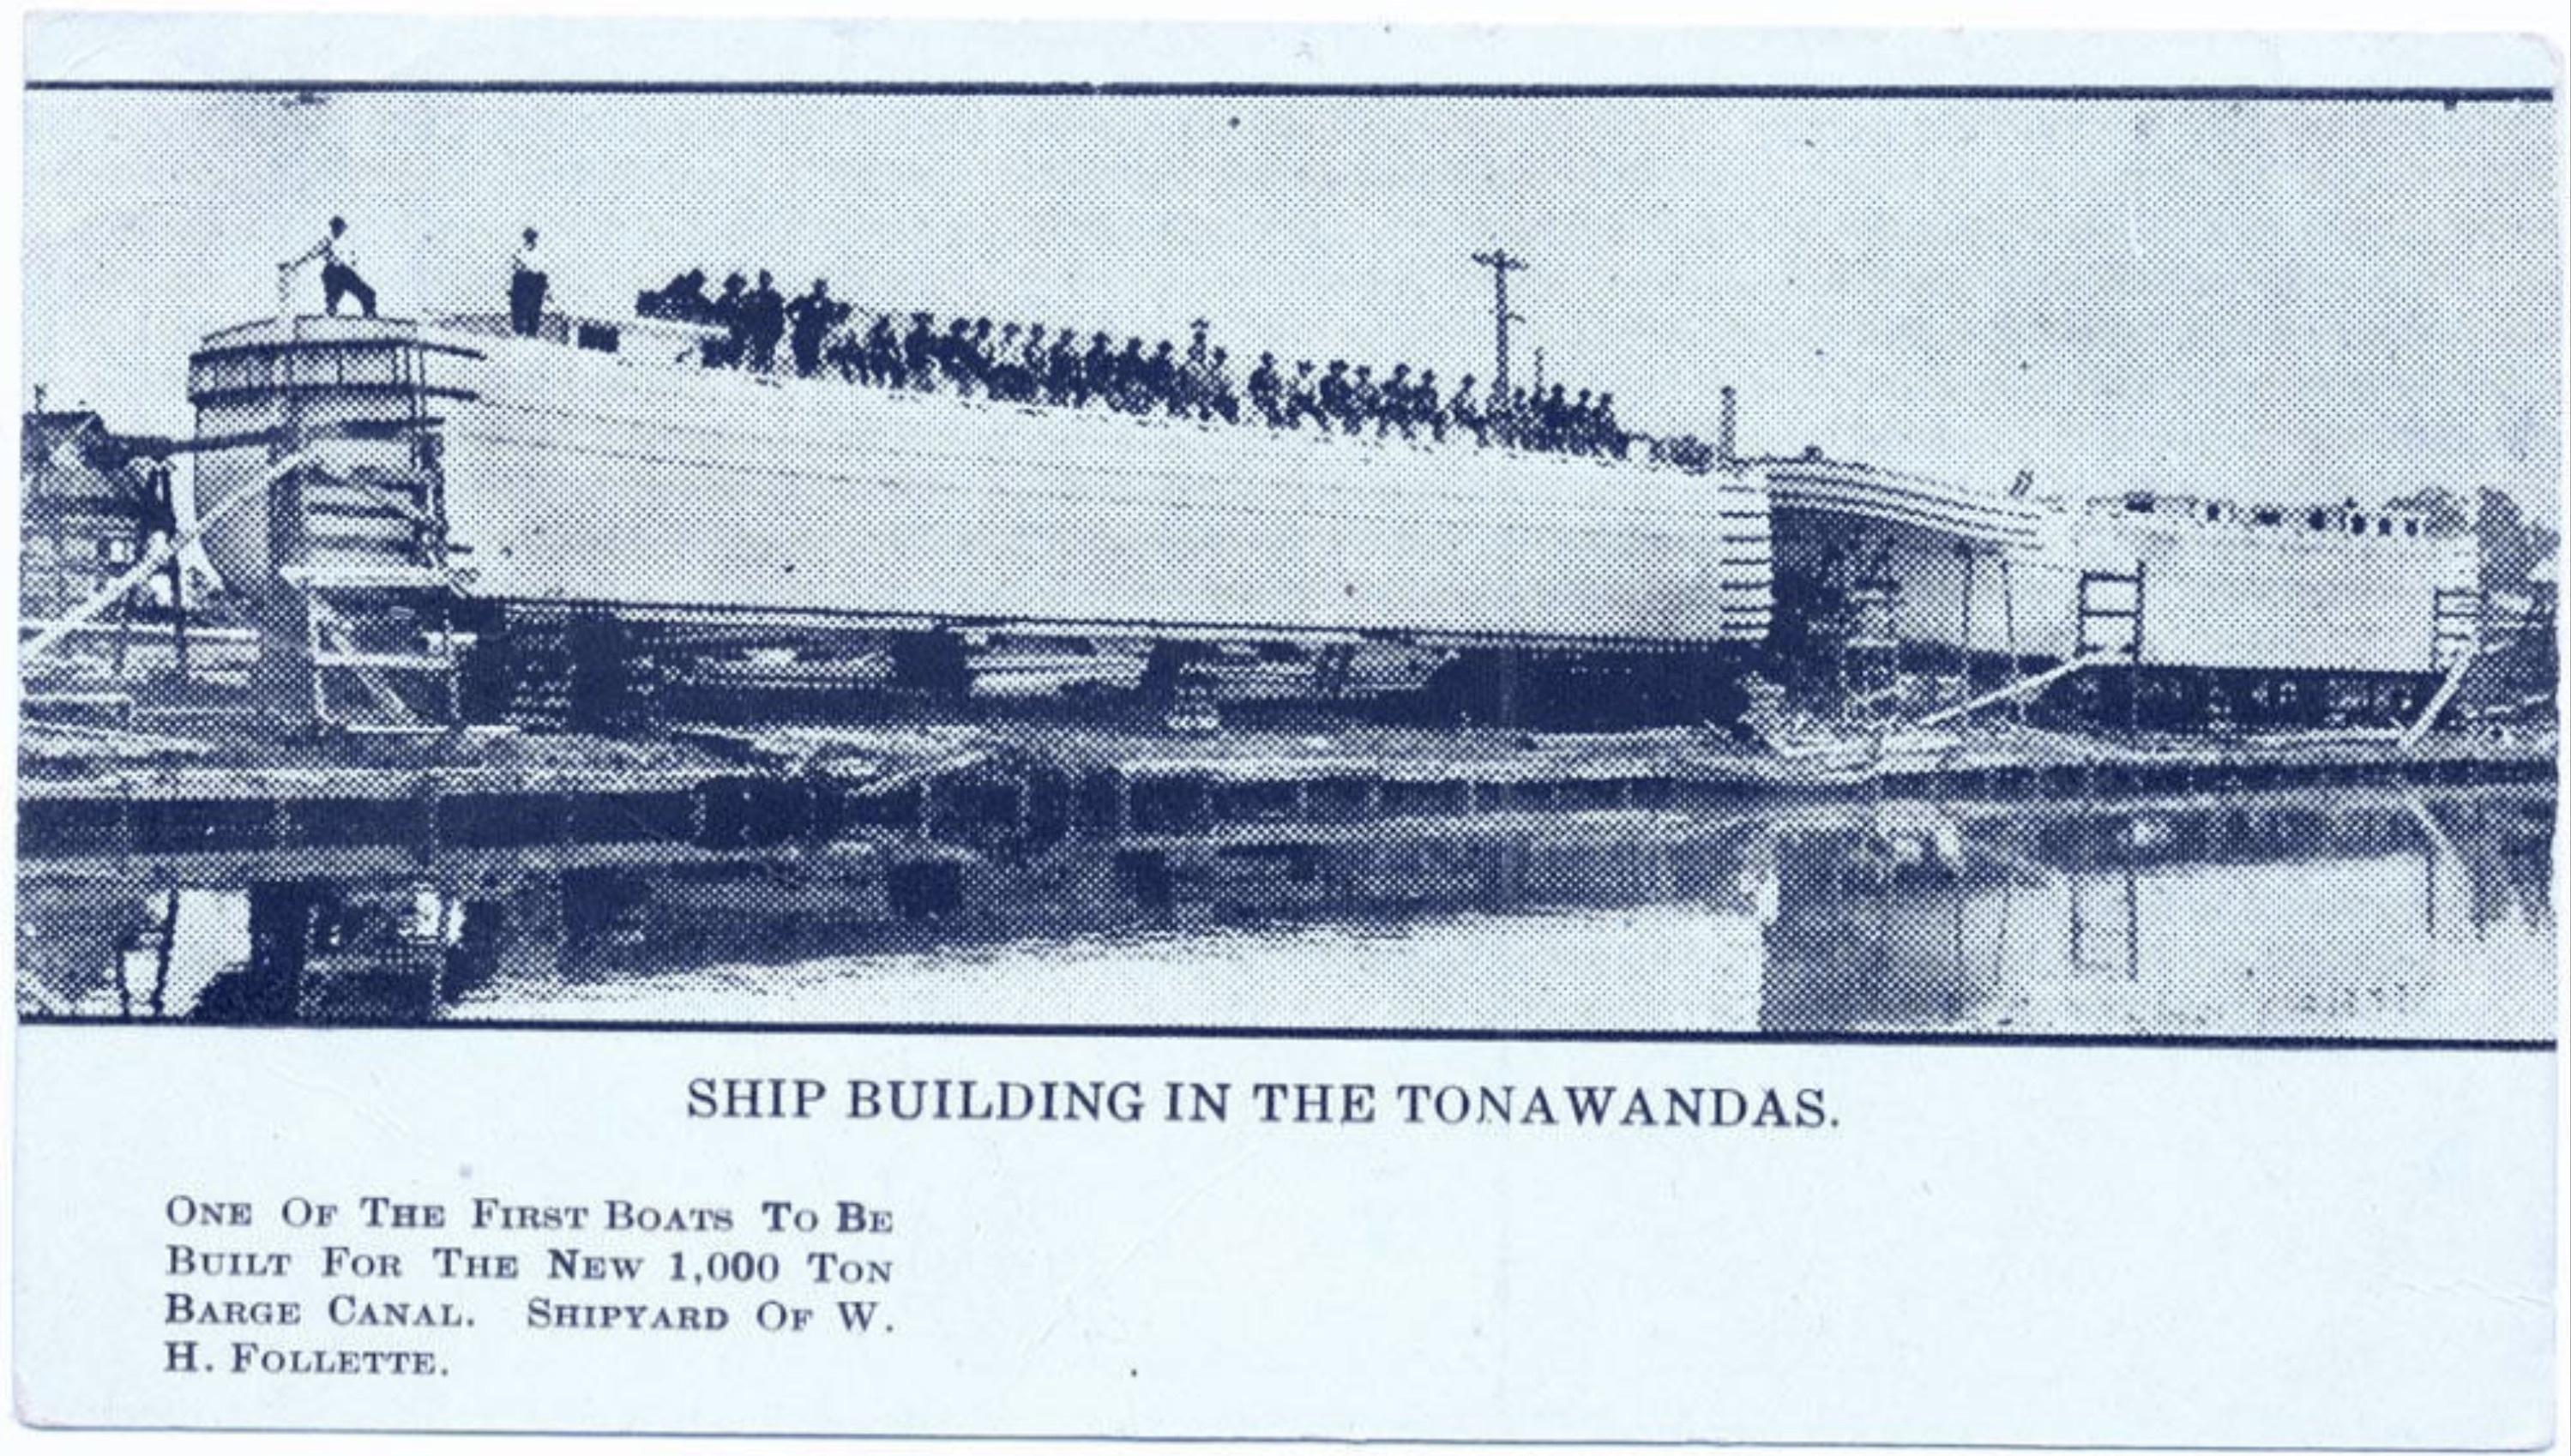 Ship building in the Tonawandas, shipyard of W. H. Follette, postcard (c1907).jpg